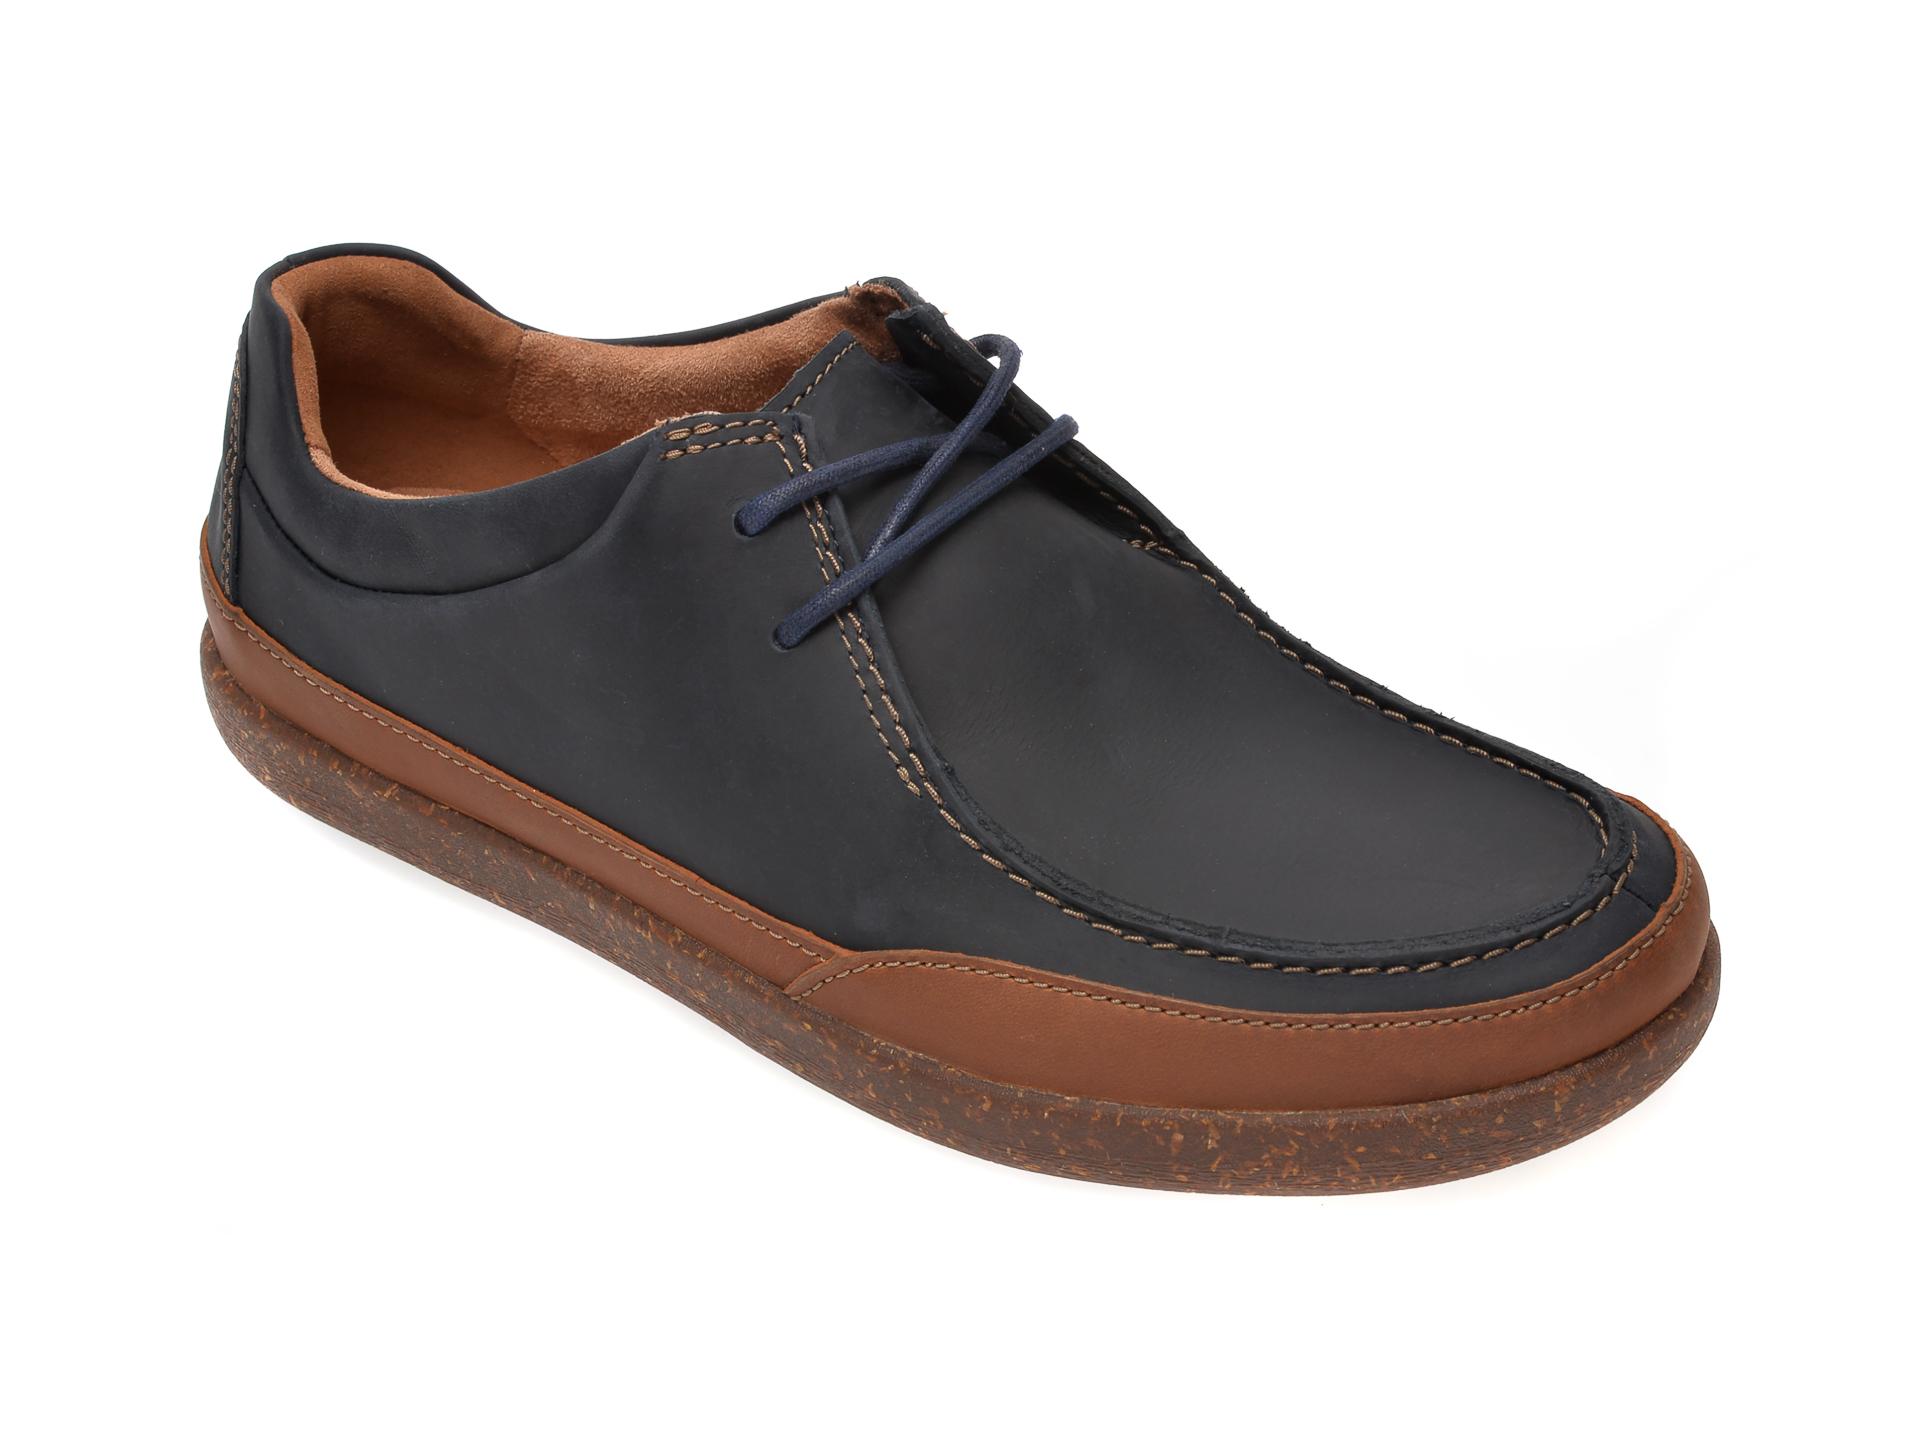 Pantofi Clarks Bleumarin, Un Lisbon Walk, Din Piele Naturala